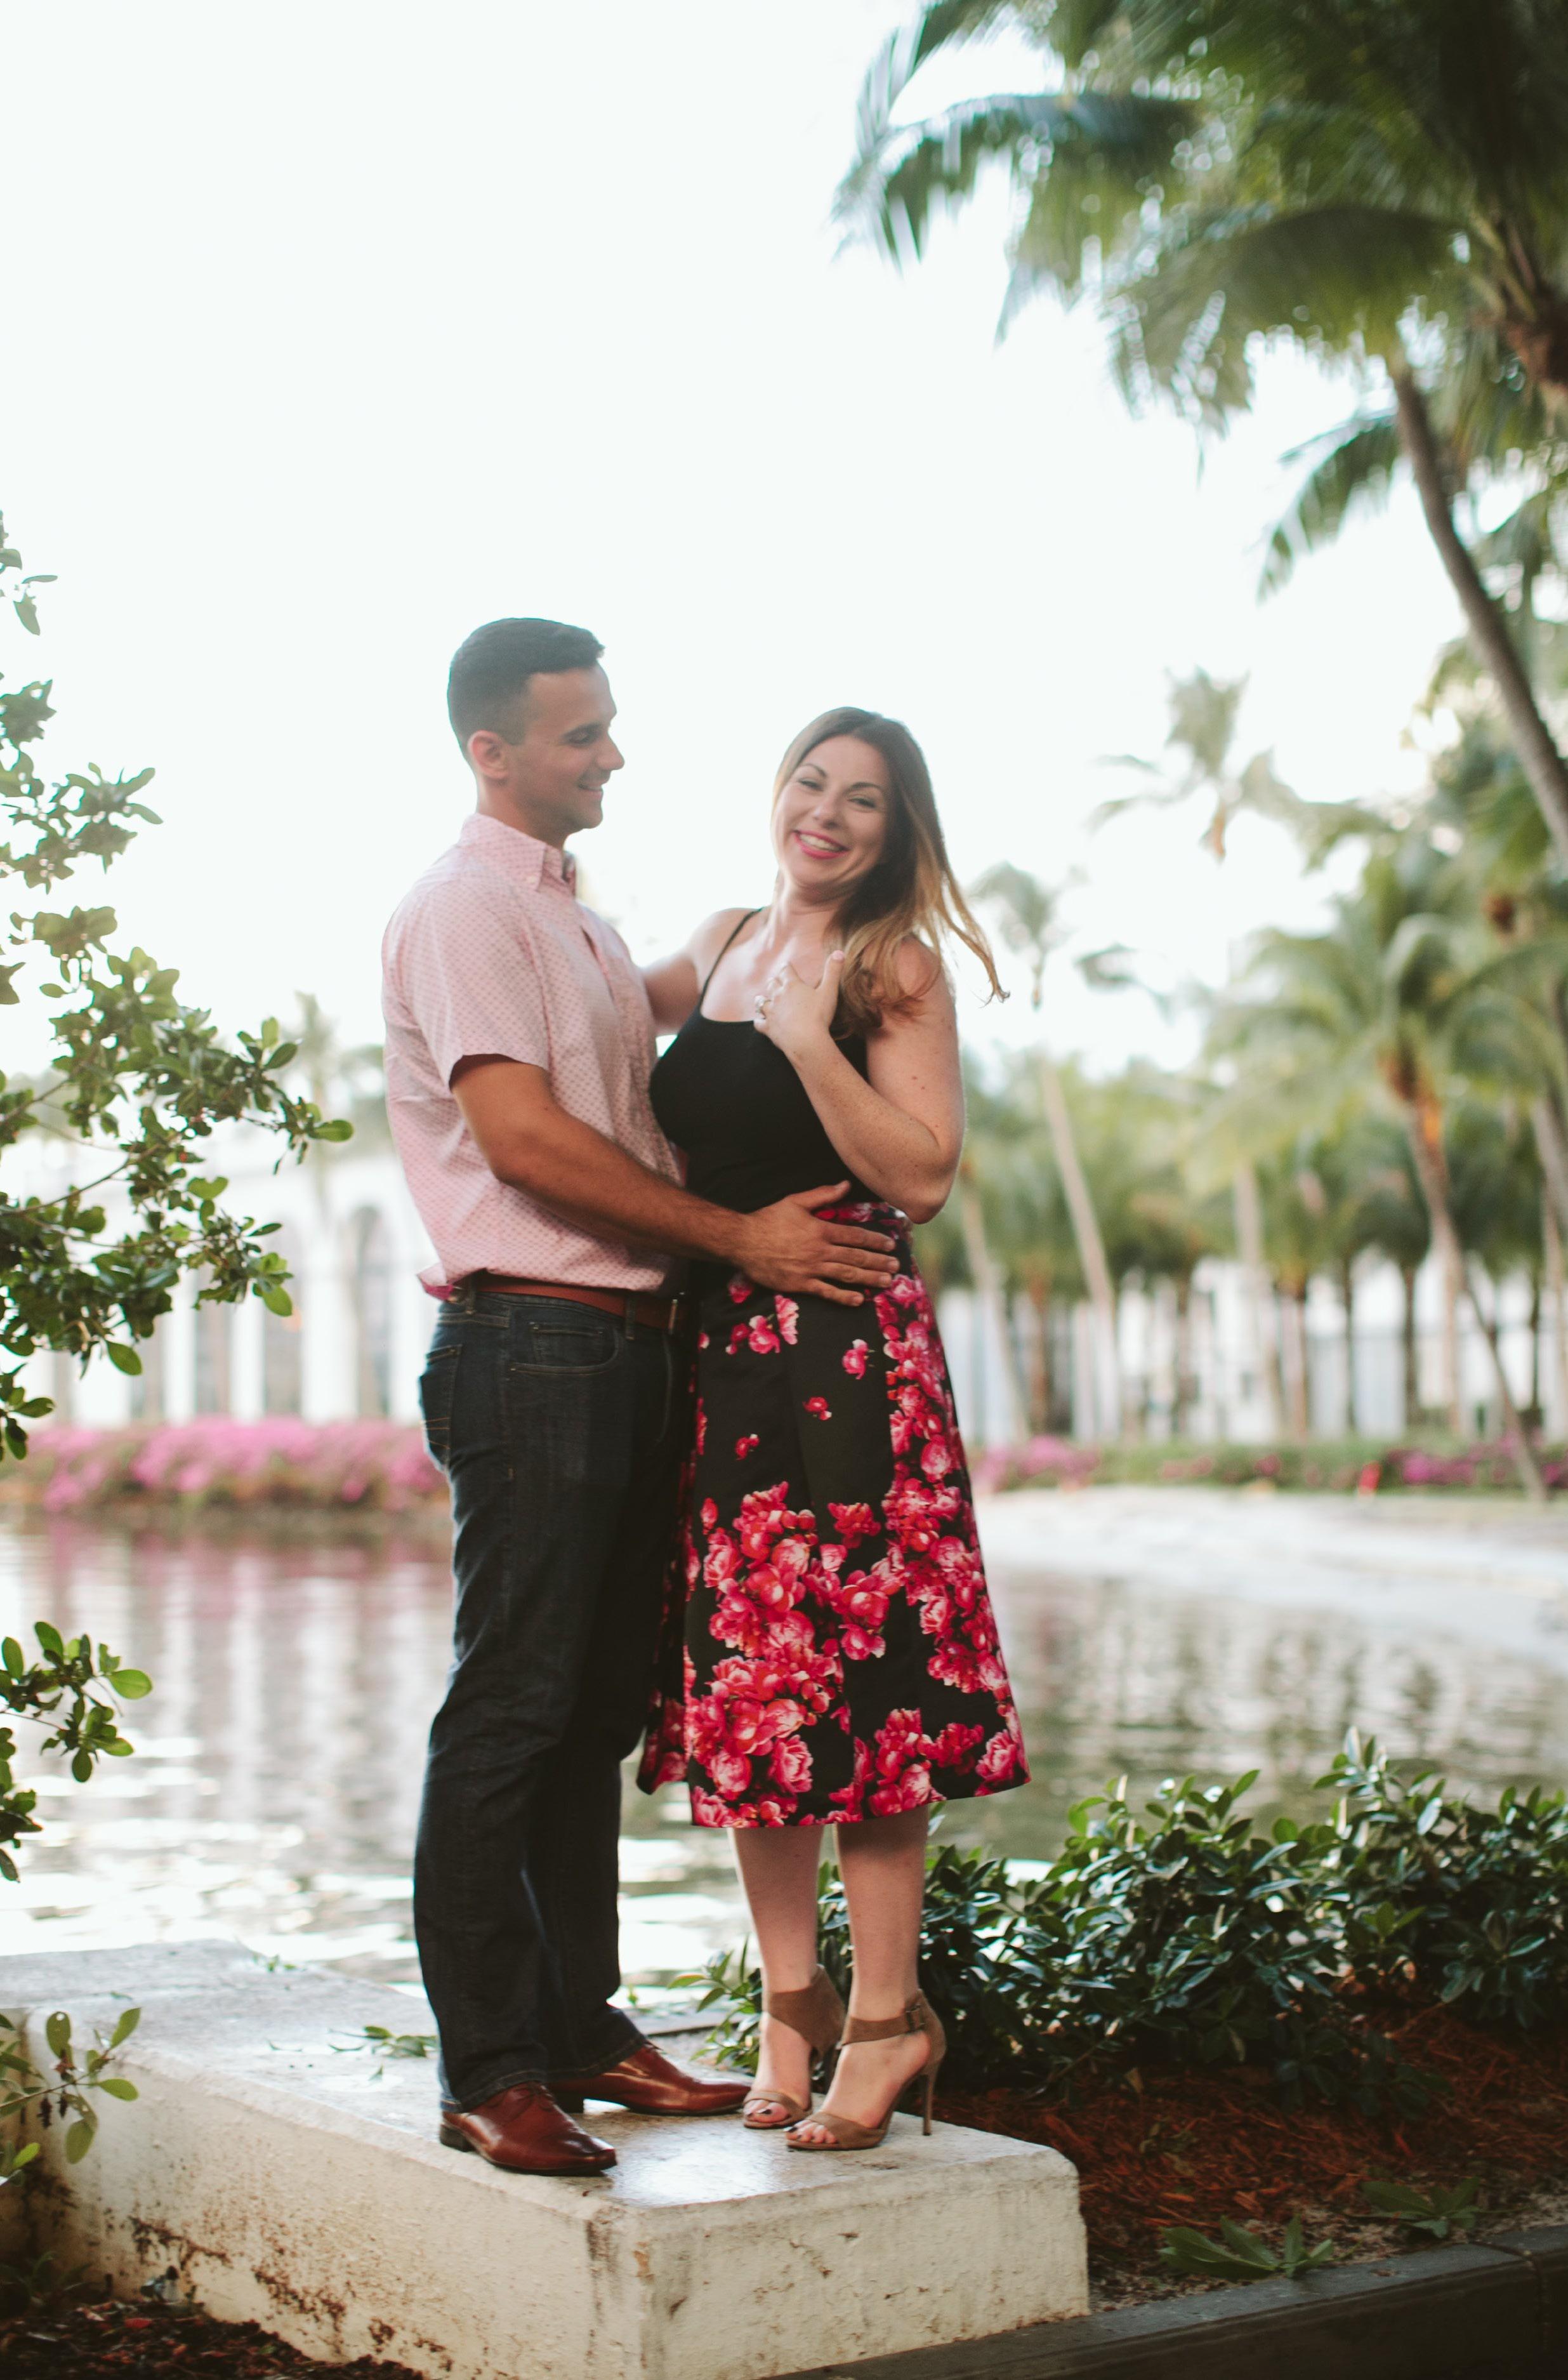 Ida + Danny Surprise Proposal Engagement Shoot at Flagler Museum Palm Beach5.jpg